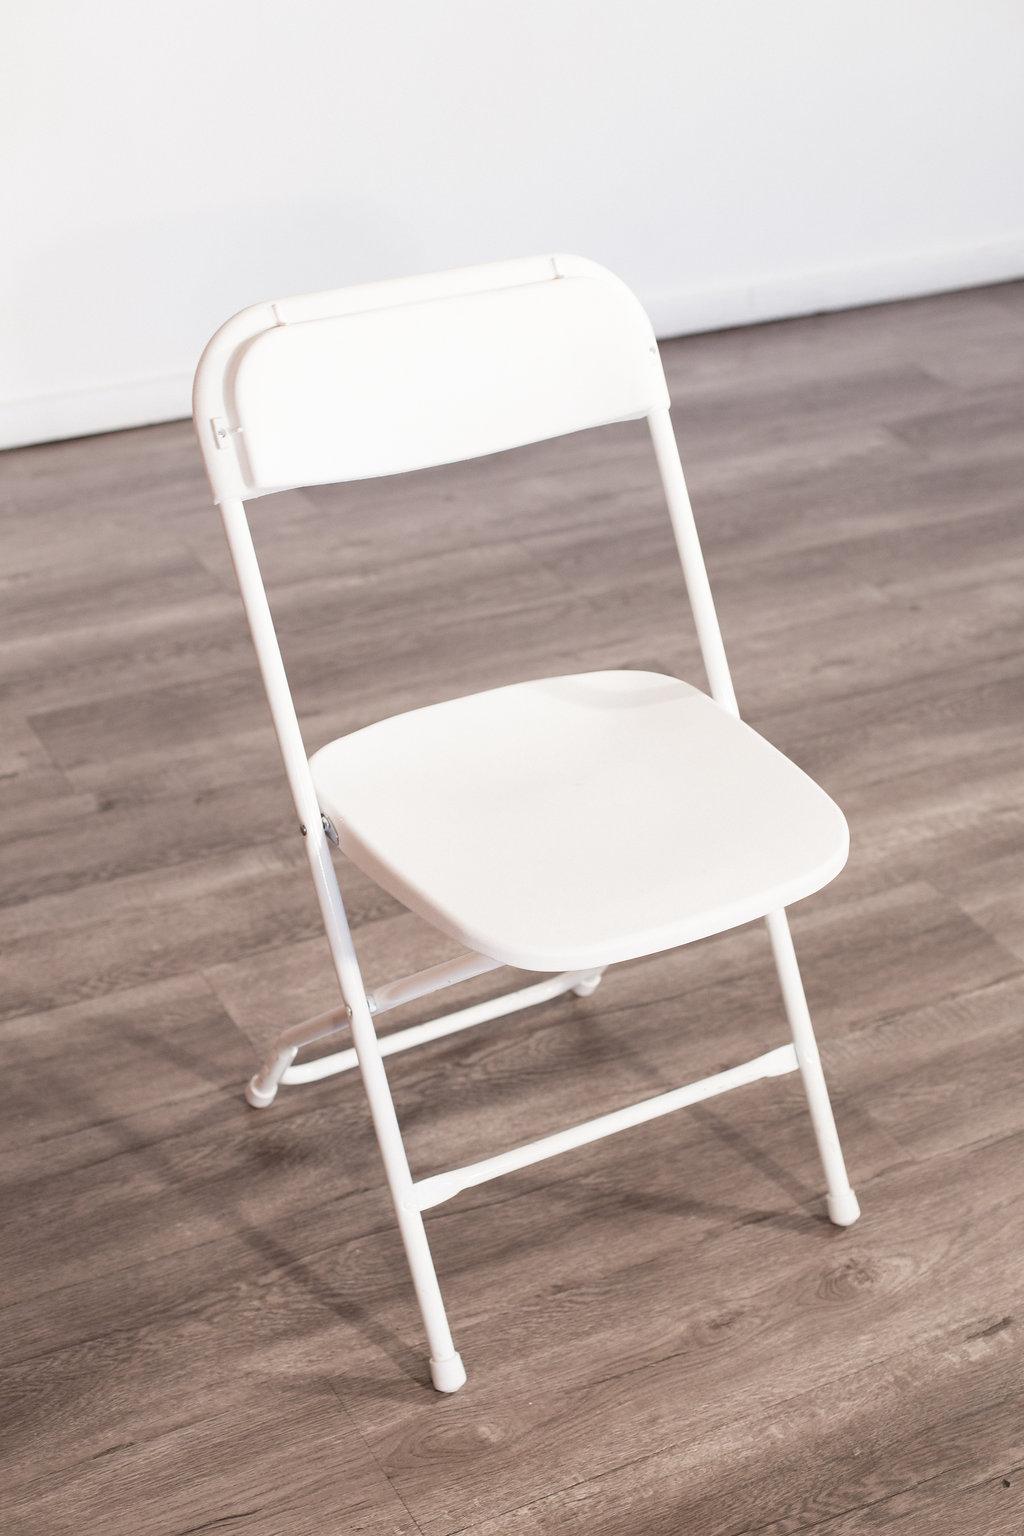 White Folding Chairs Quantity: 140 Price: $2 EA